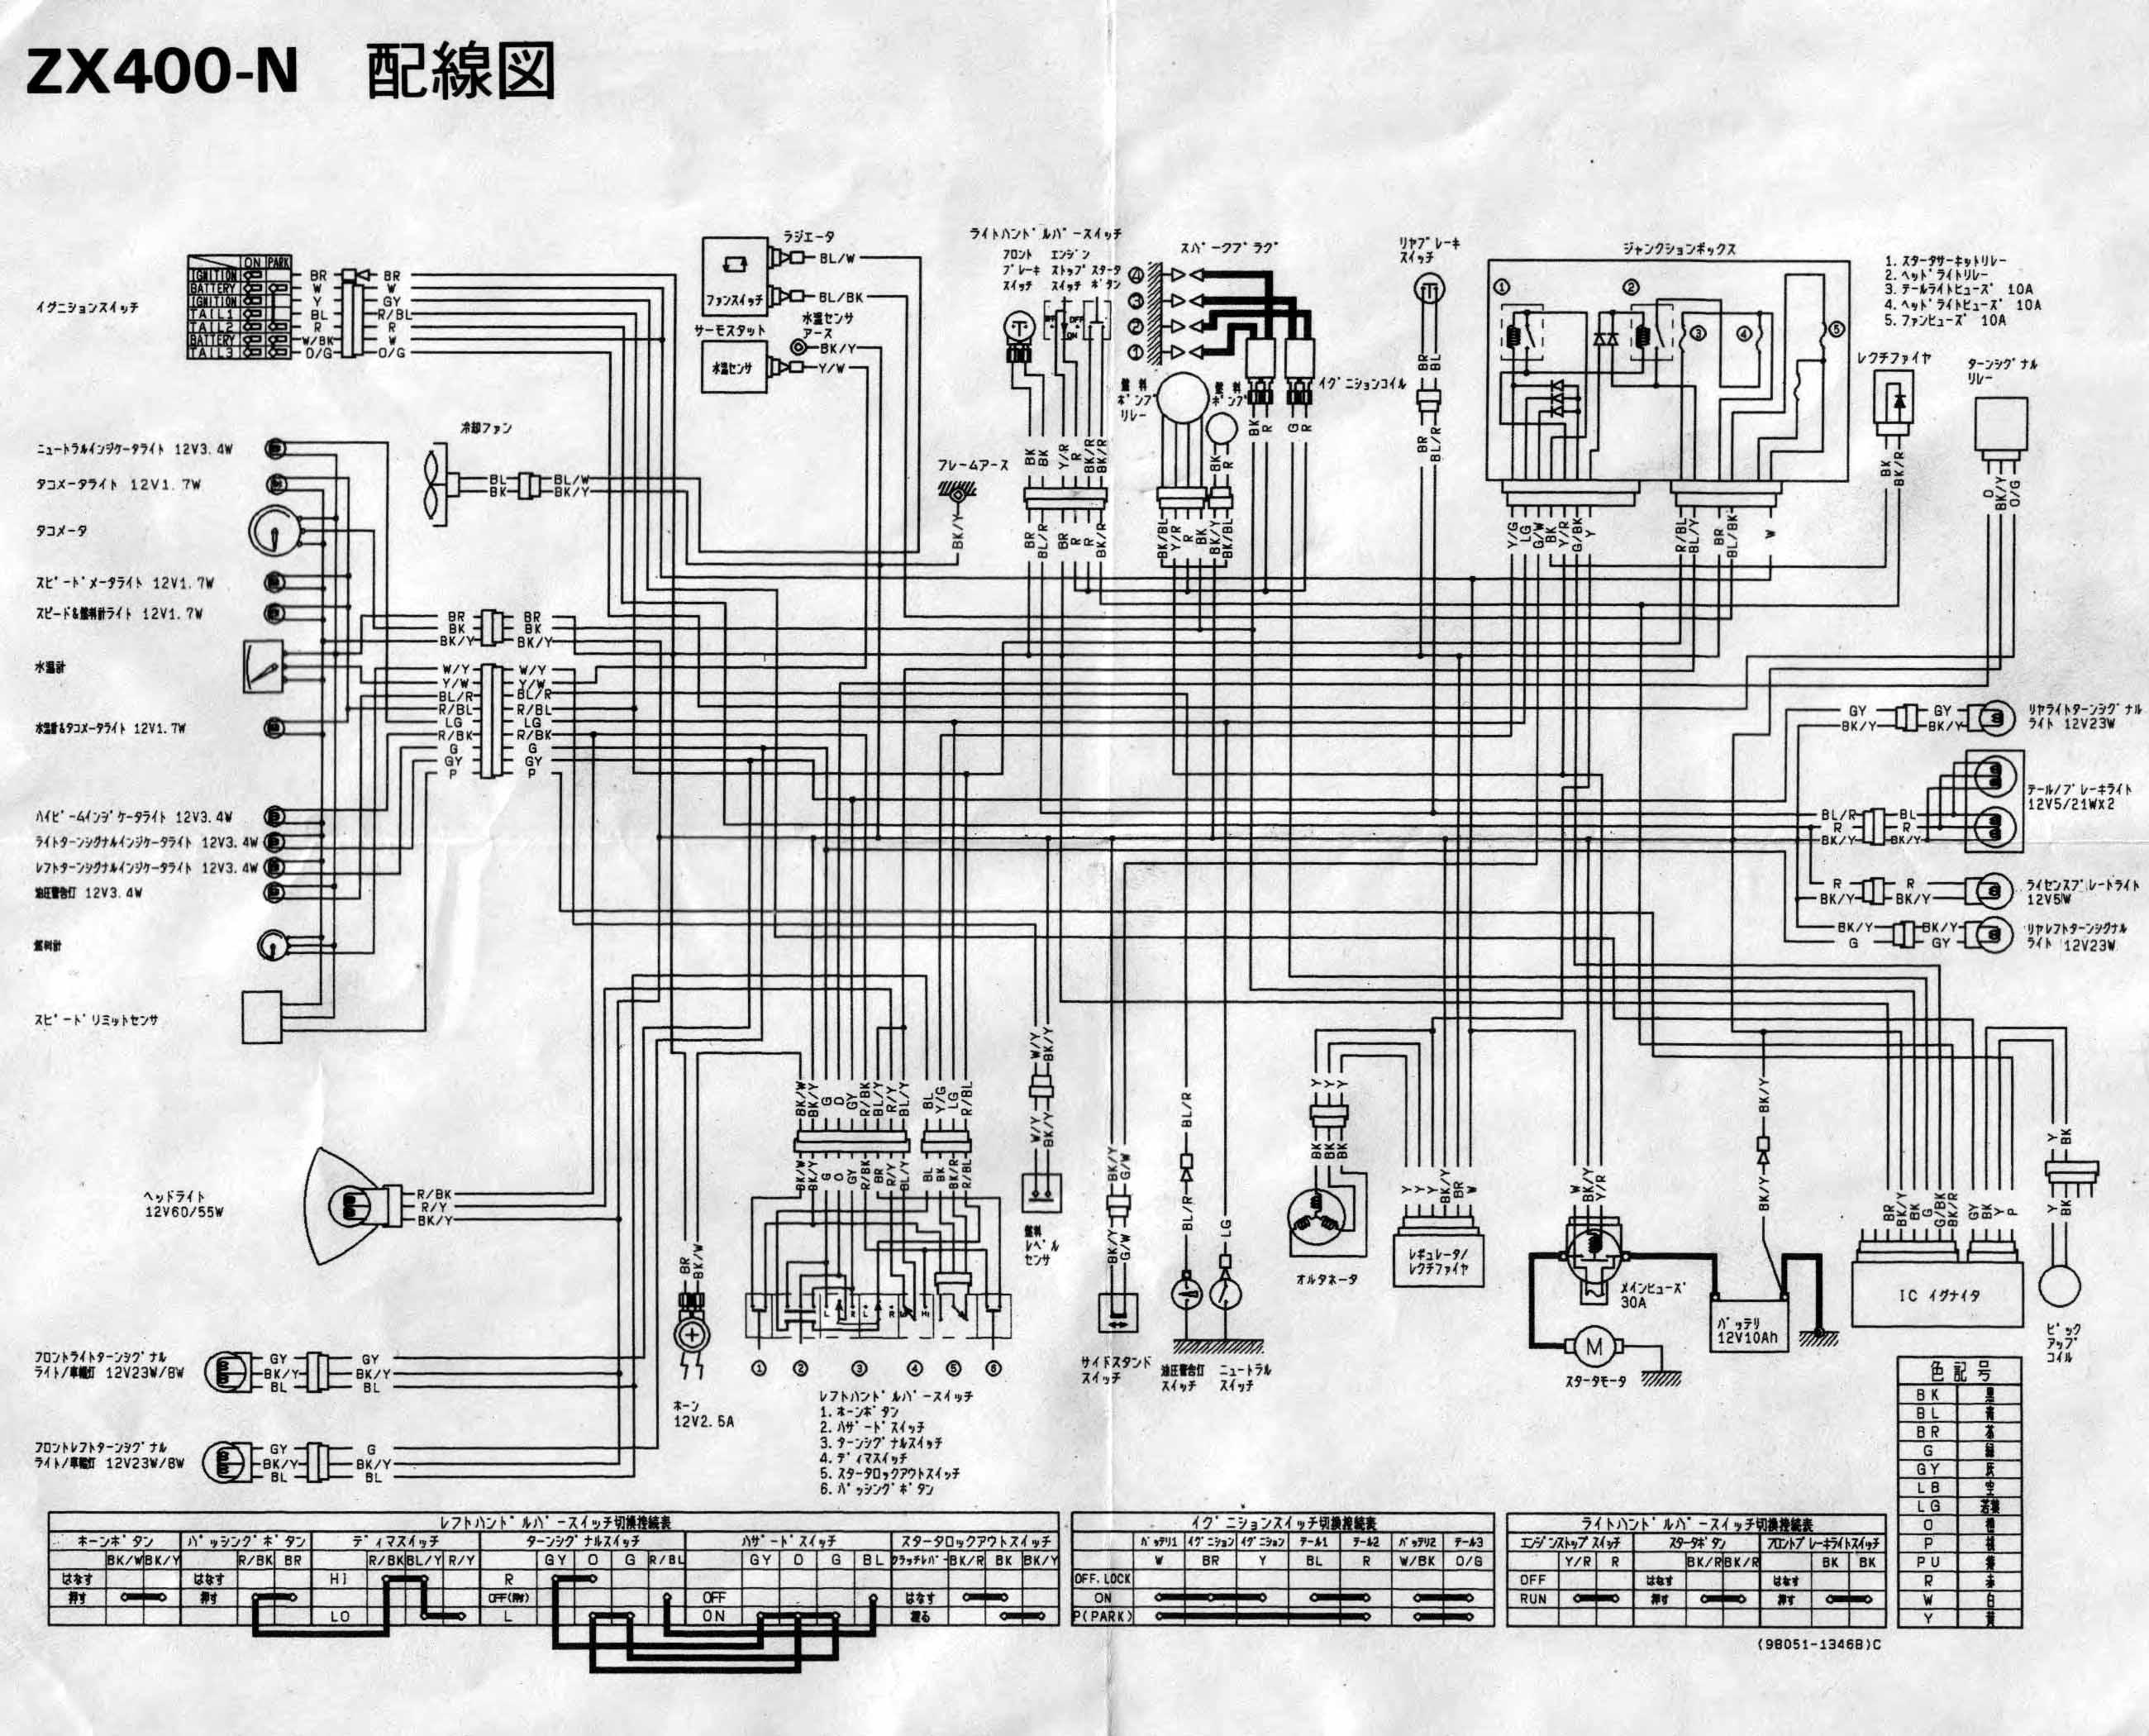 small resolution of download moto schem kawasaki zx400n zzr400 moto schem kawasaki zx400n zzr400